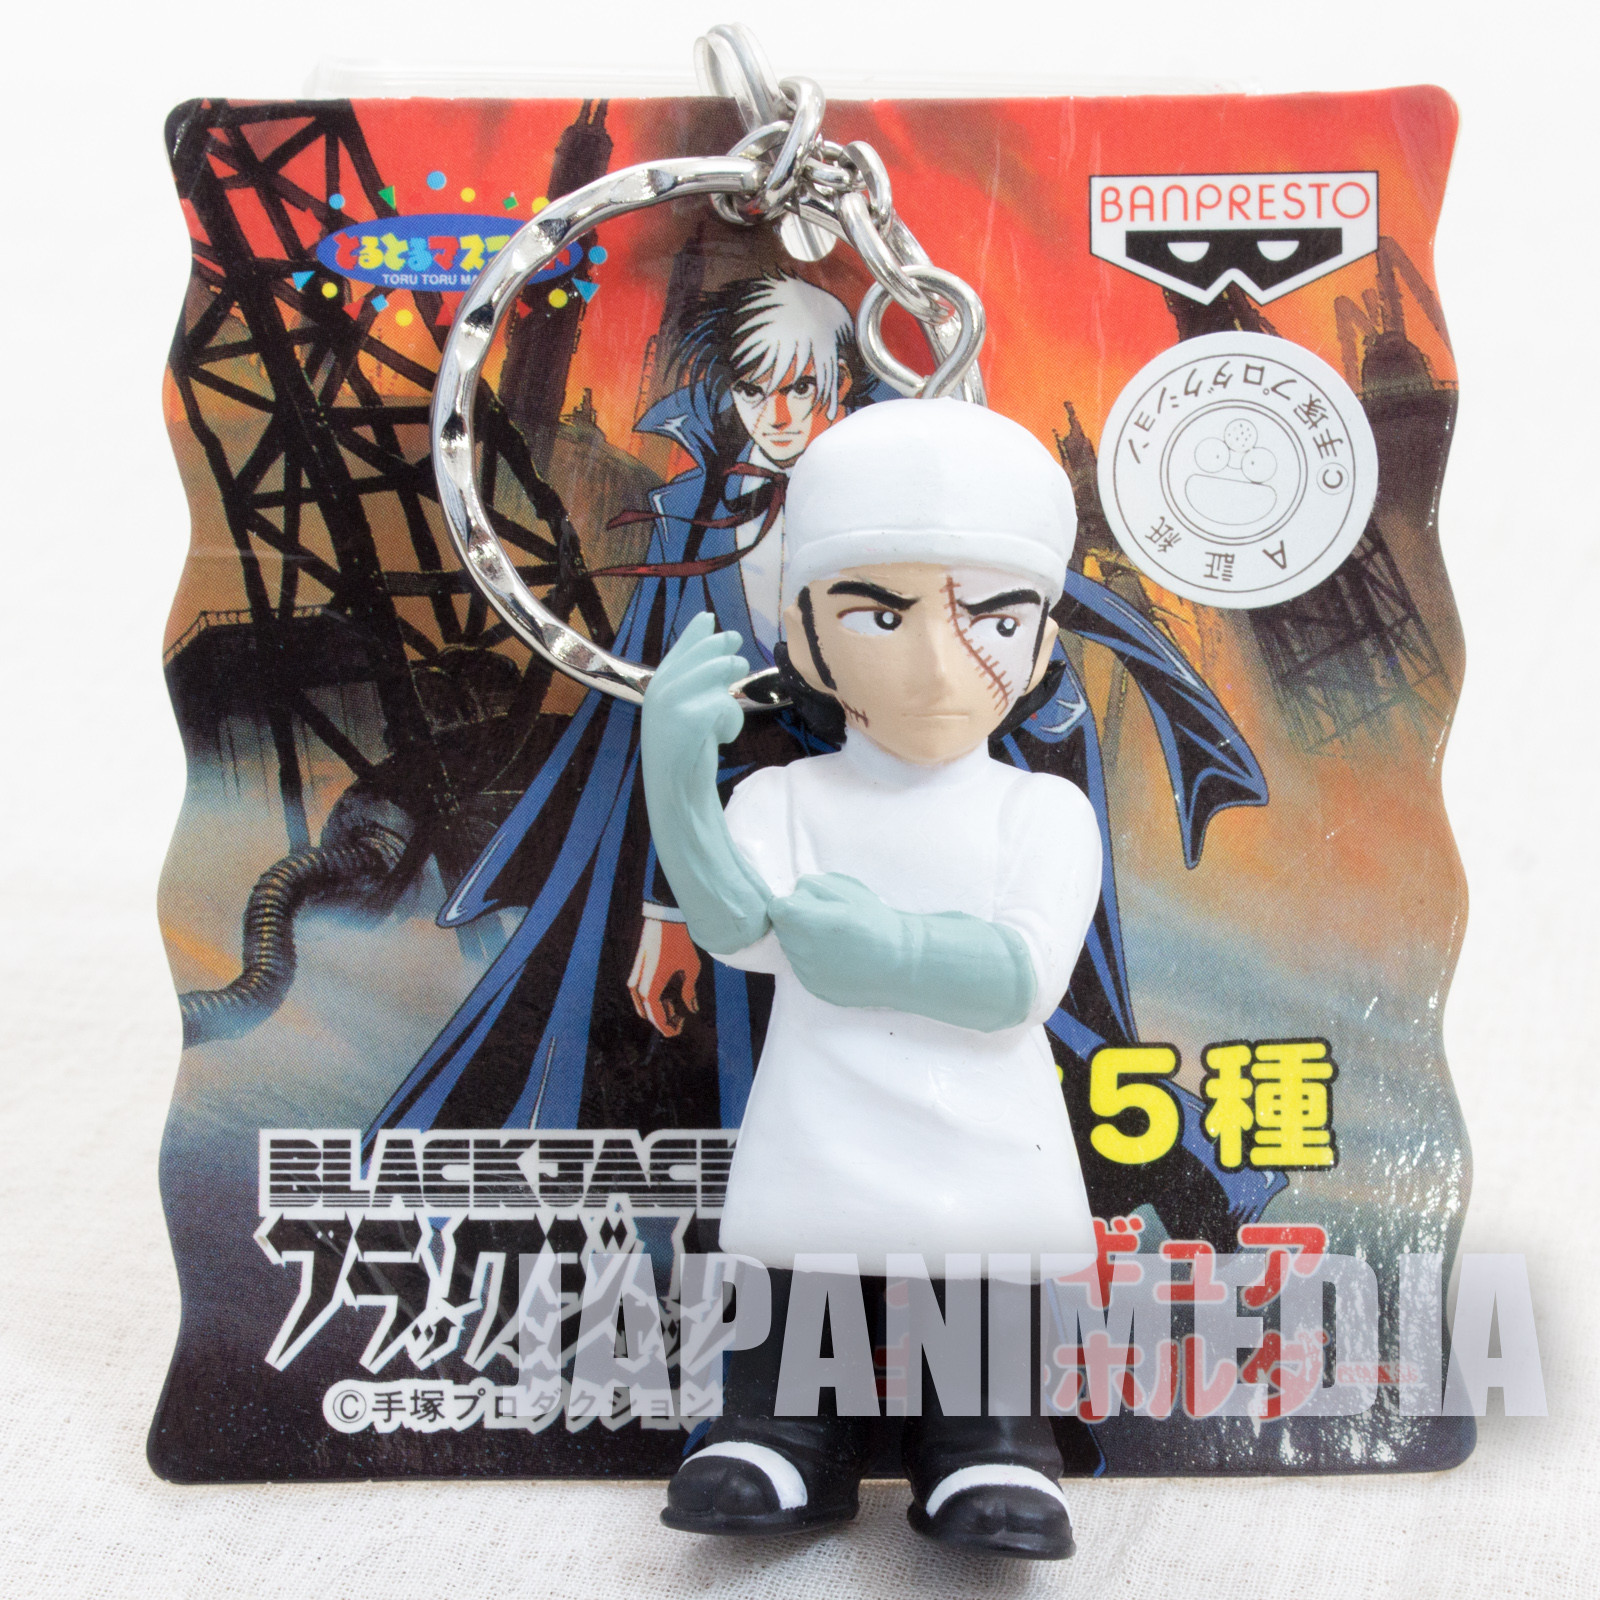 Black Jack Surgical Suit Mascot Figure Key Chain Osamu Tezuka JAPAN ANIME MANGA